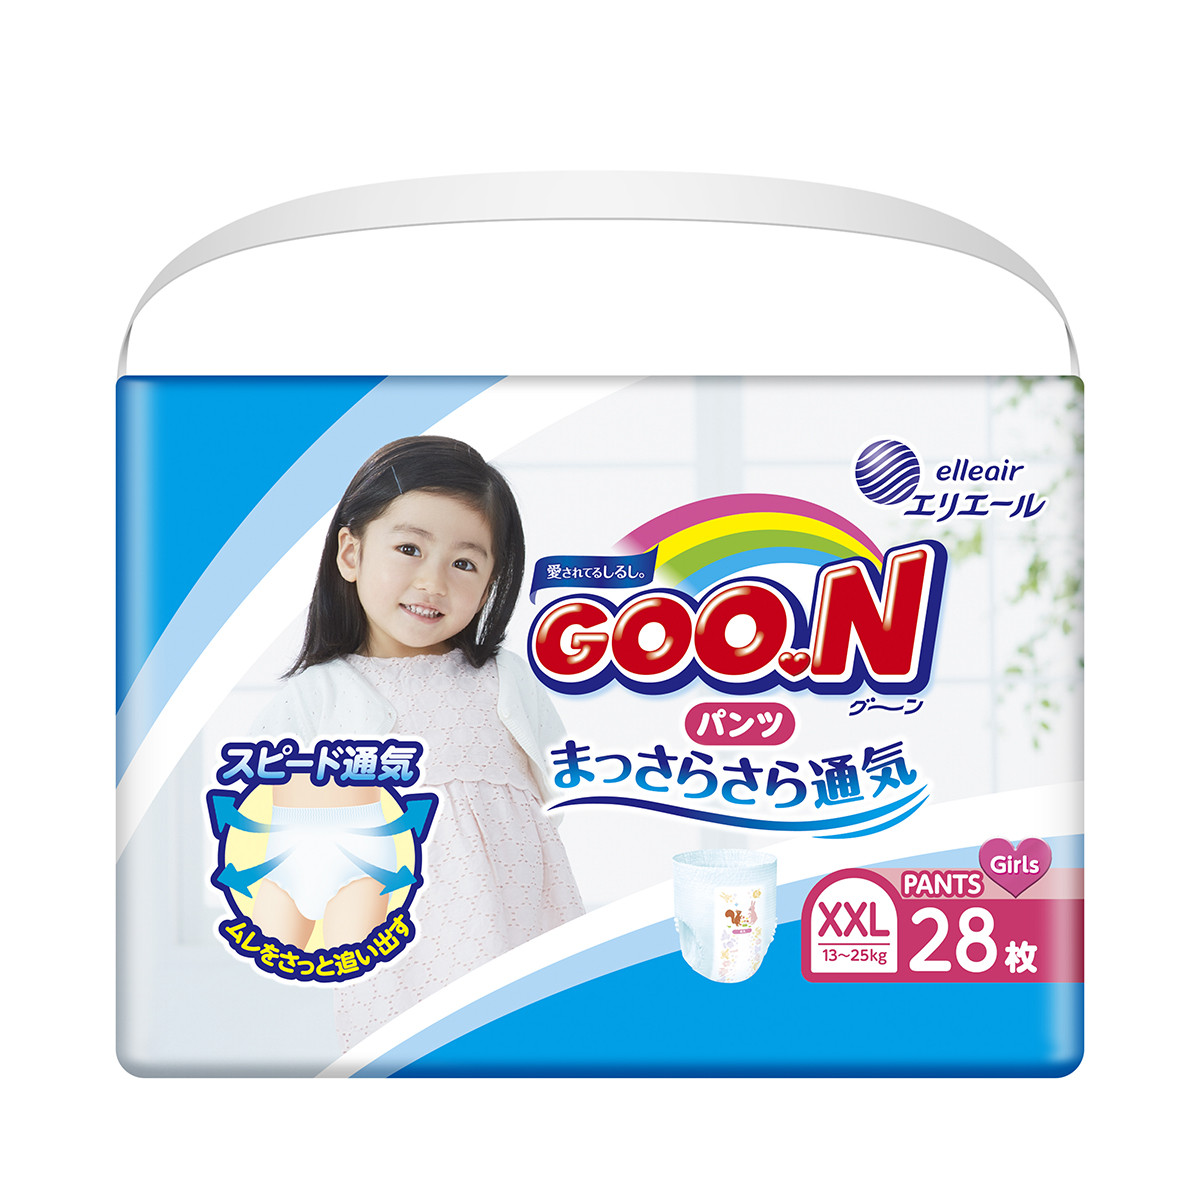 Трусики-подгузники Goo.N для девочек коллекция 2019 (XXL, 13-25 кг)